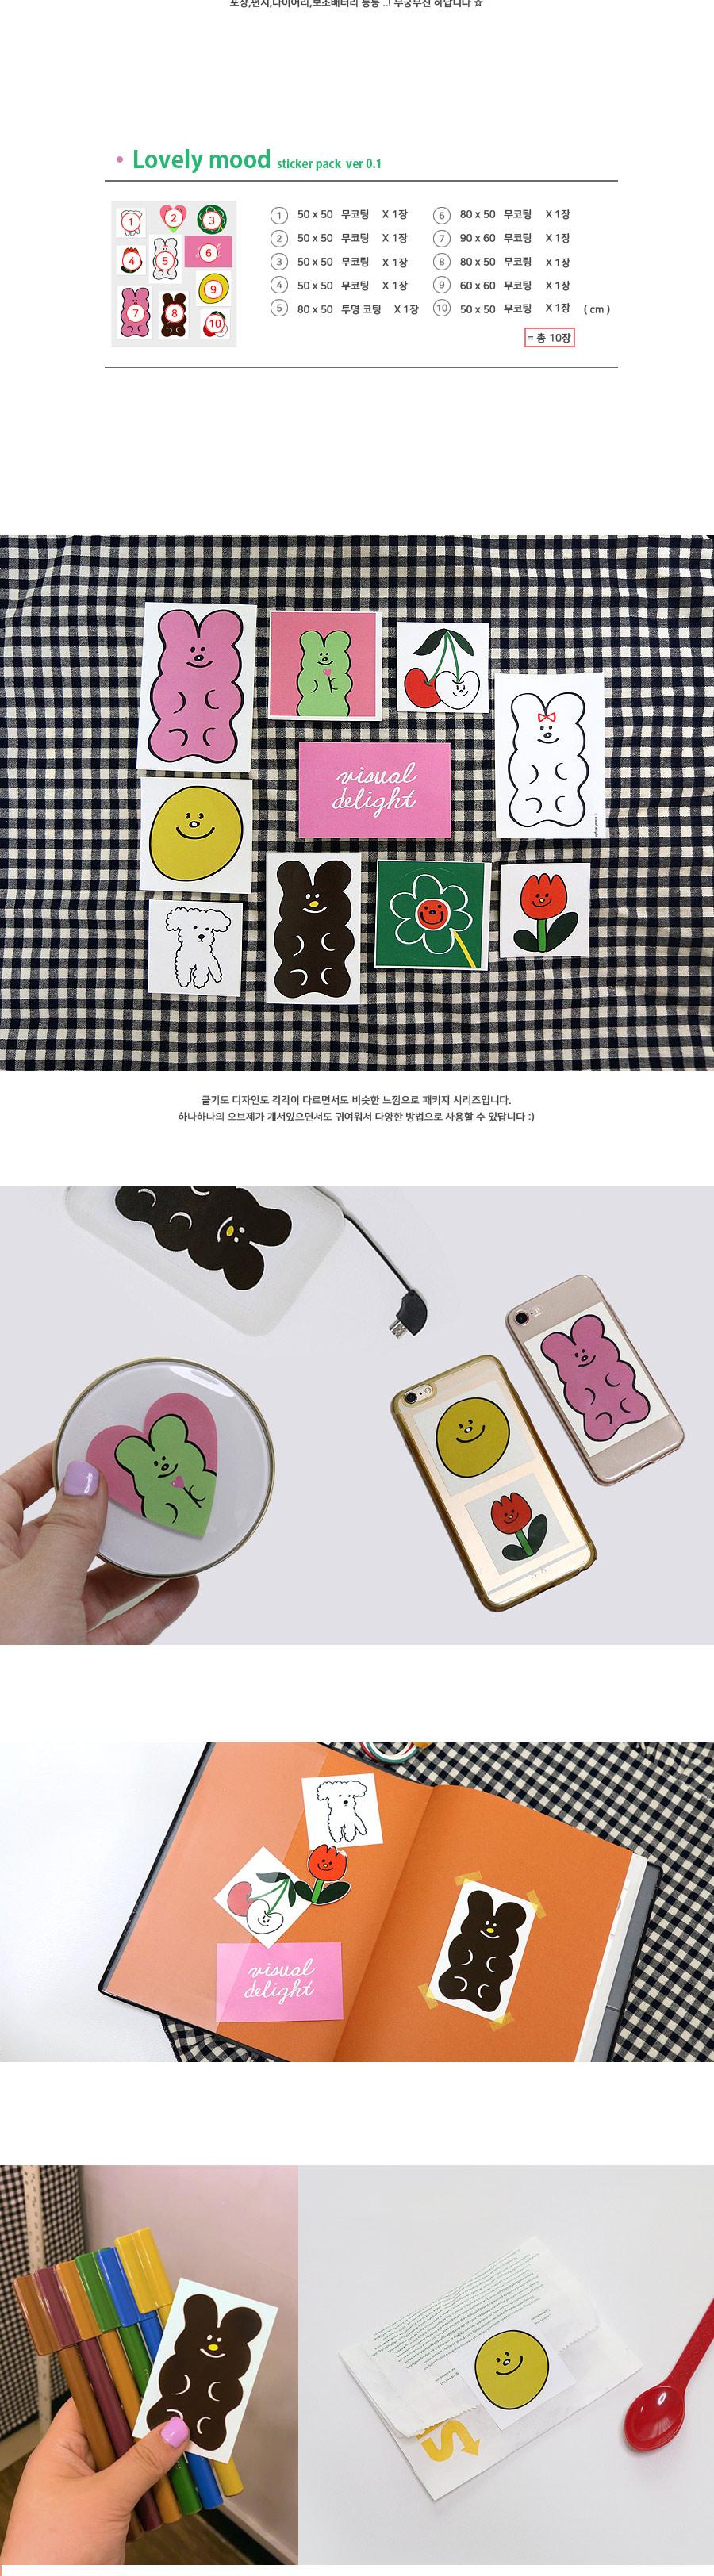 Lovely mood sticker pack 스티커팩 ( small x 10 ) - 비주얼 딜라이트, 1,200원, 스티커, 디자인스티커